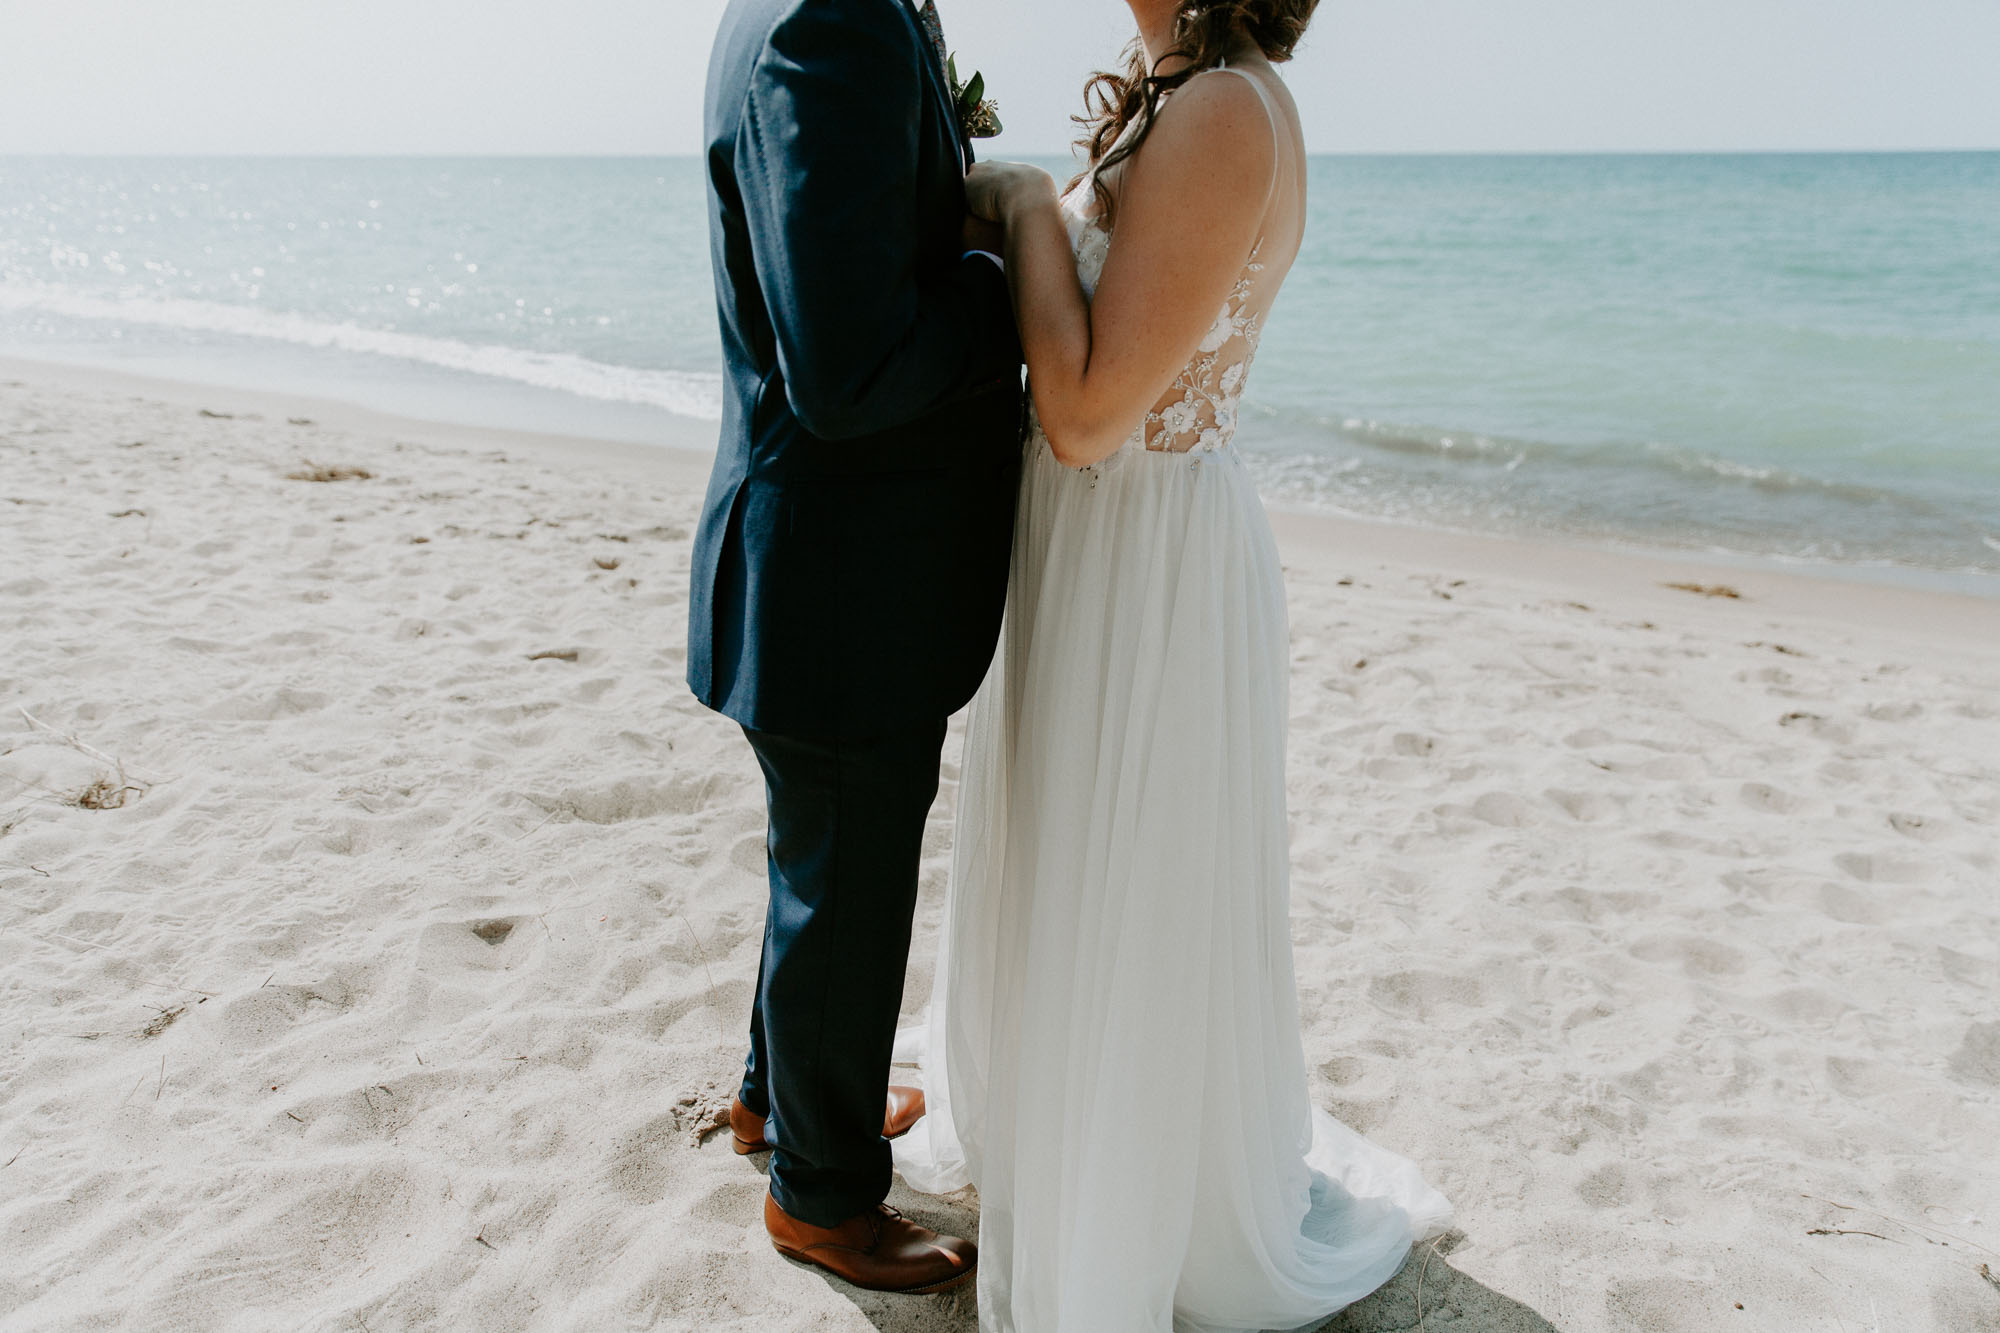 journeyman_distillery_wedding_photographer_chicago_il_wright_photographs-6118.jpg